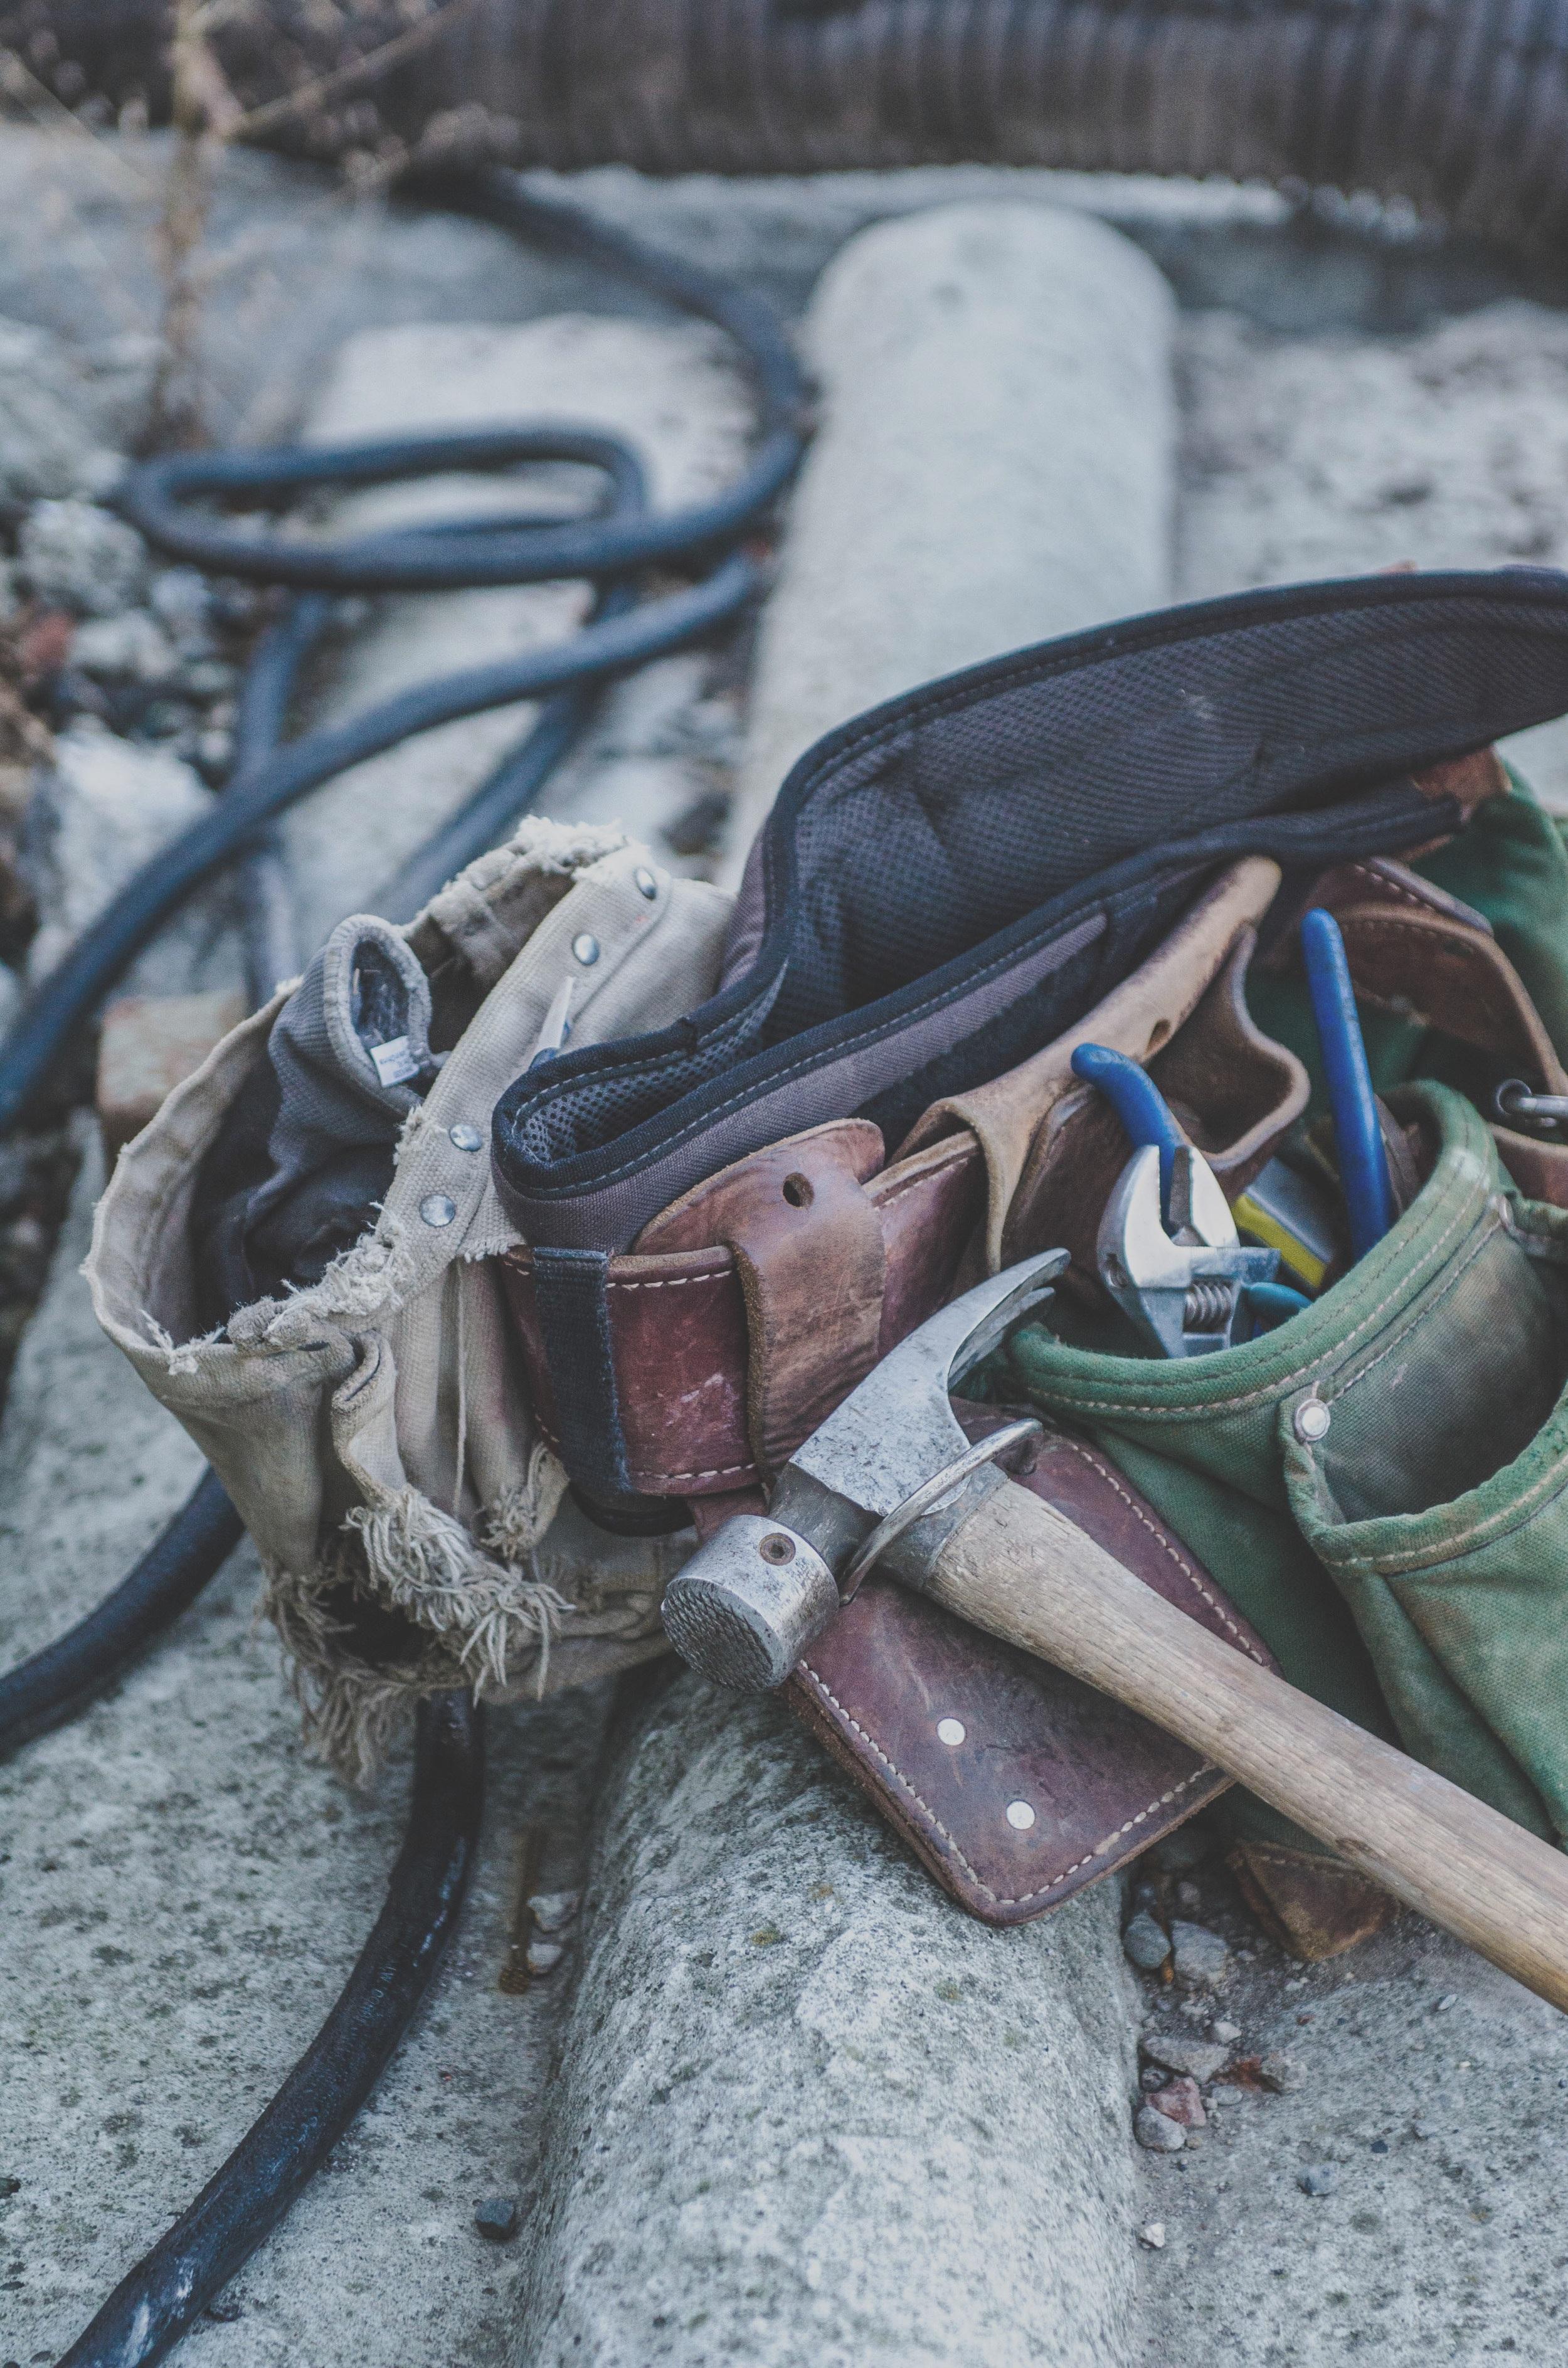 Equipment Repairs & Installations -